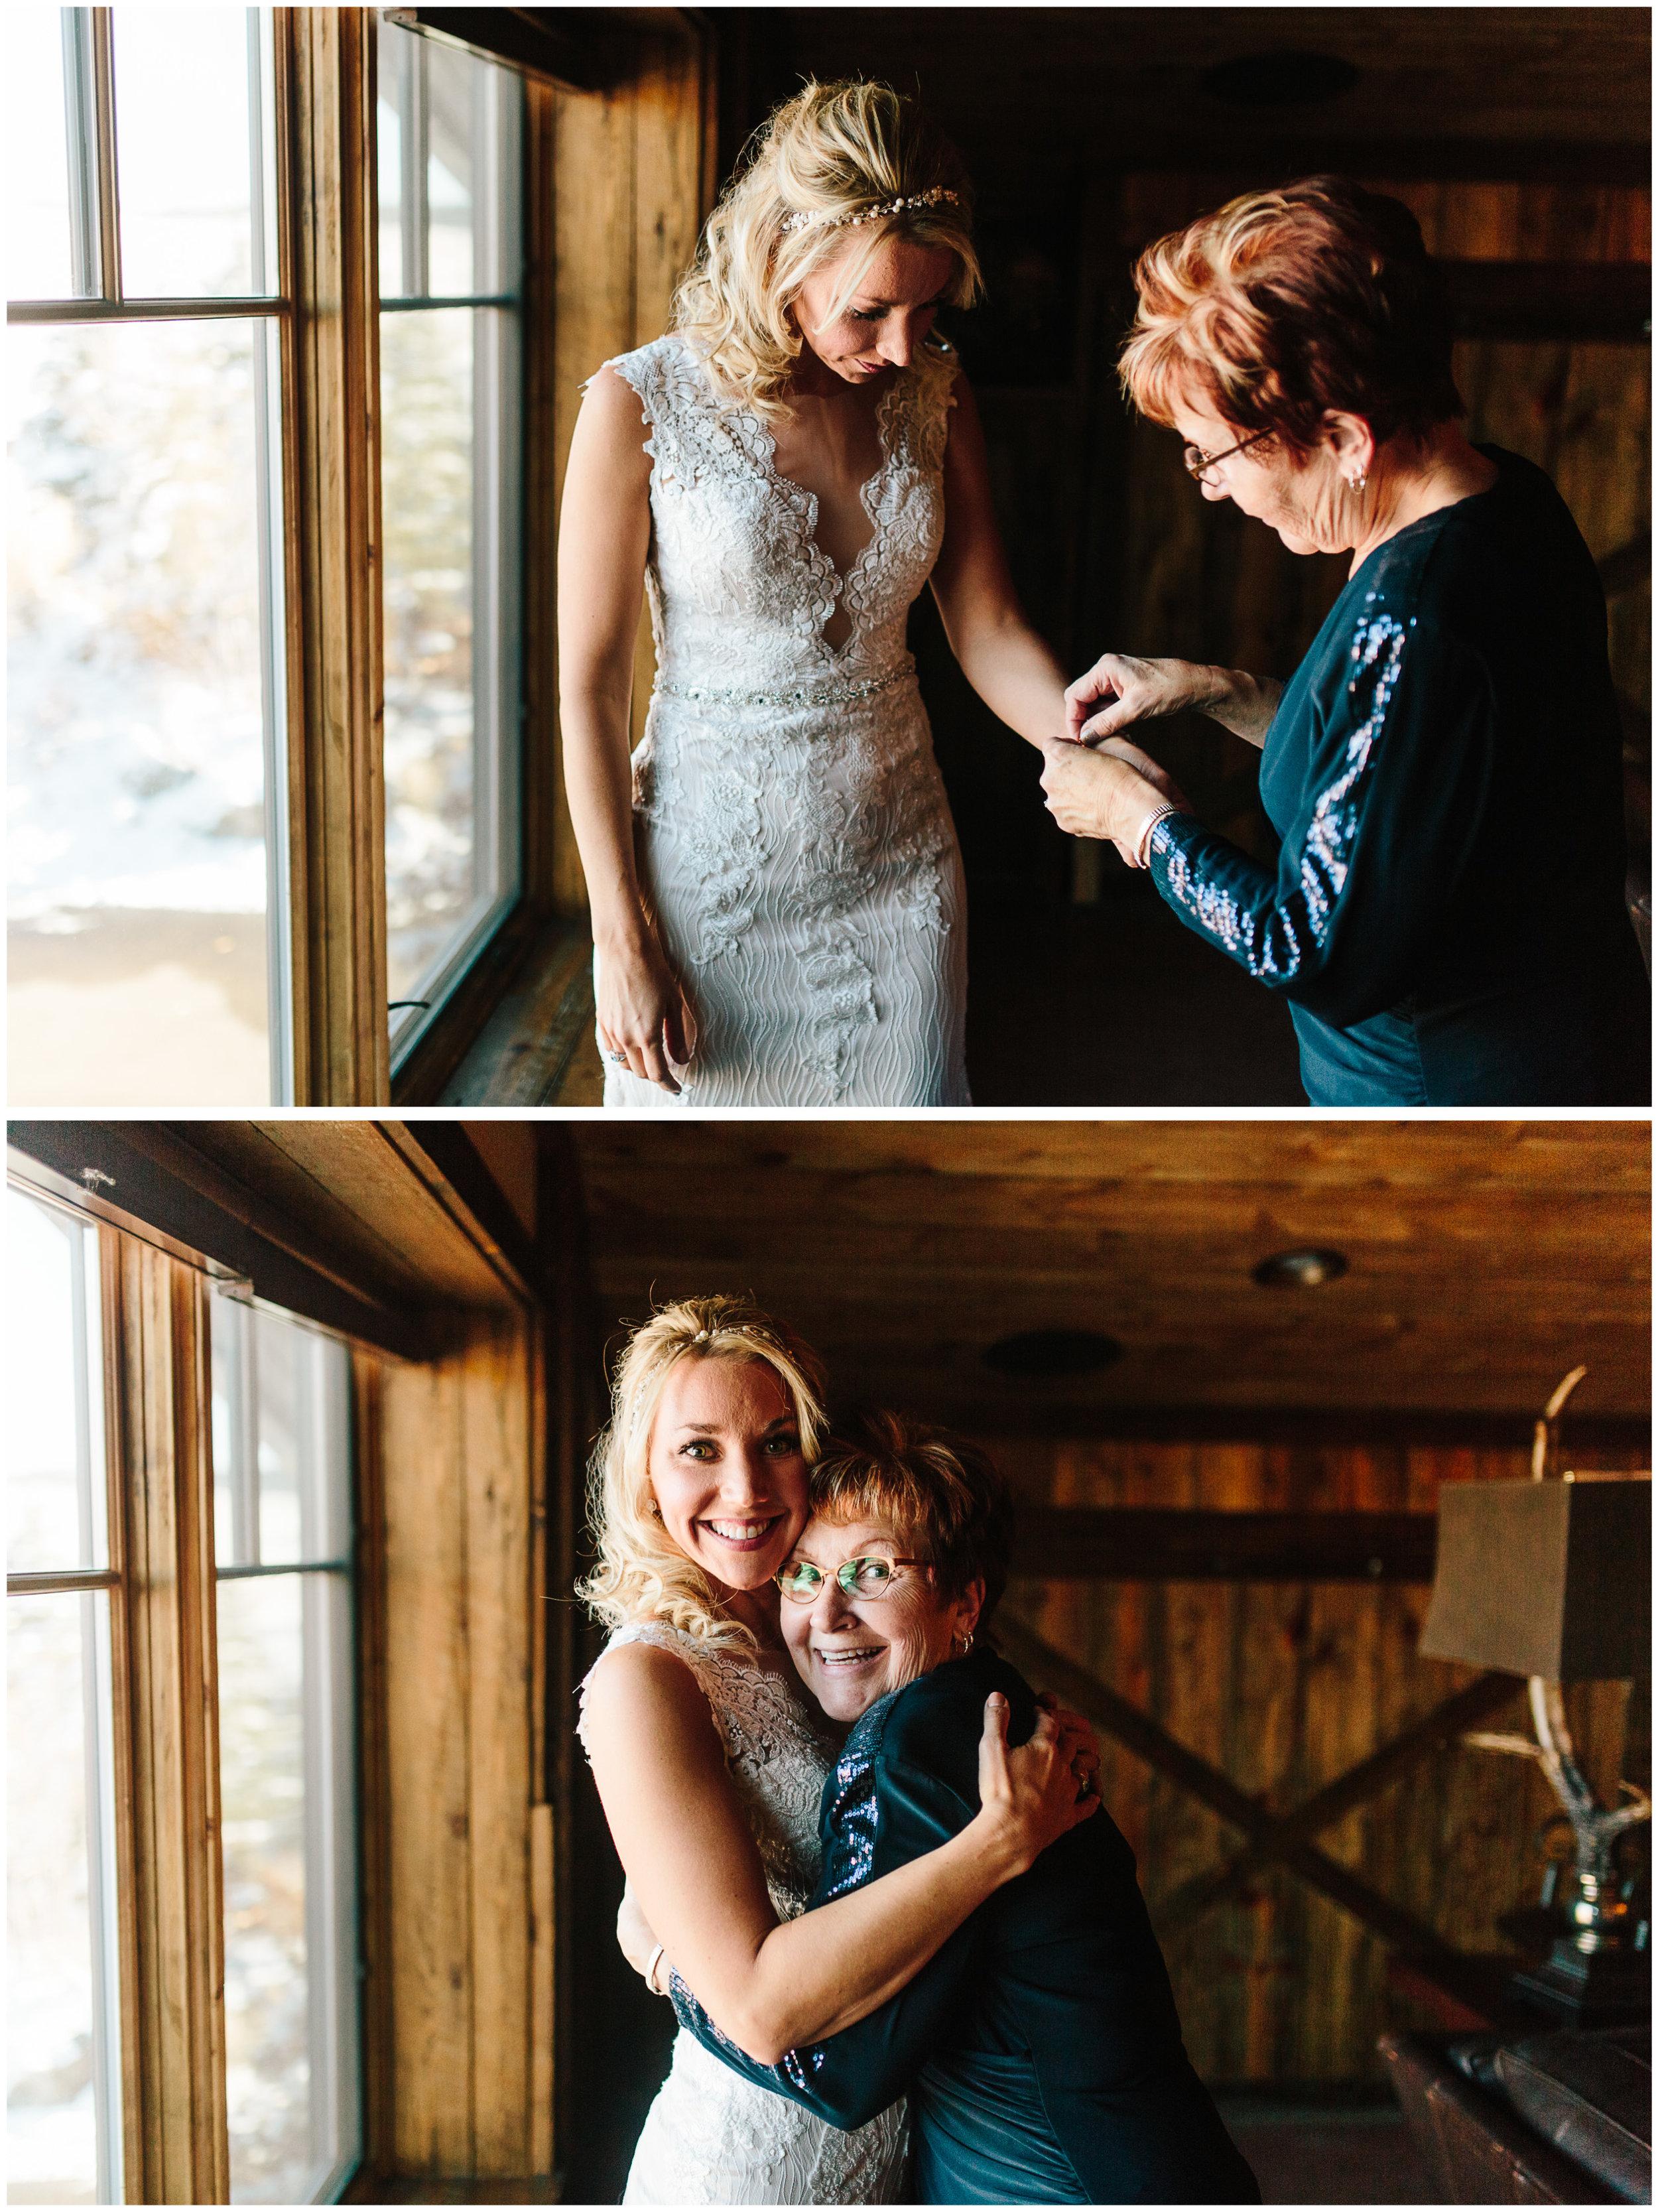 spruce_mountain_ranch_wedding_11.jpg